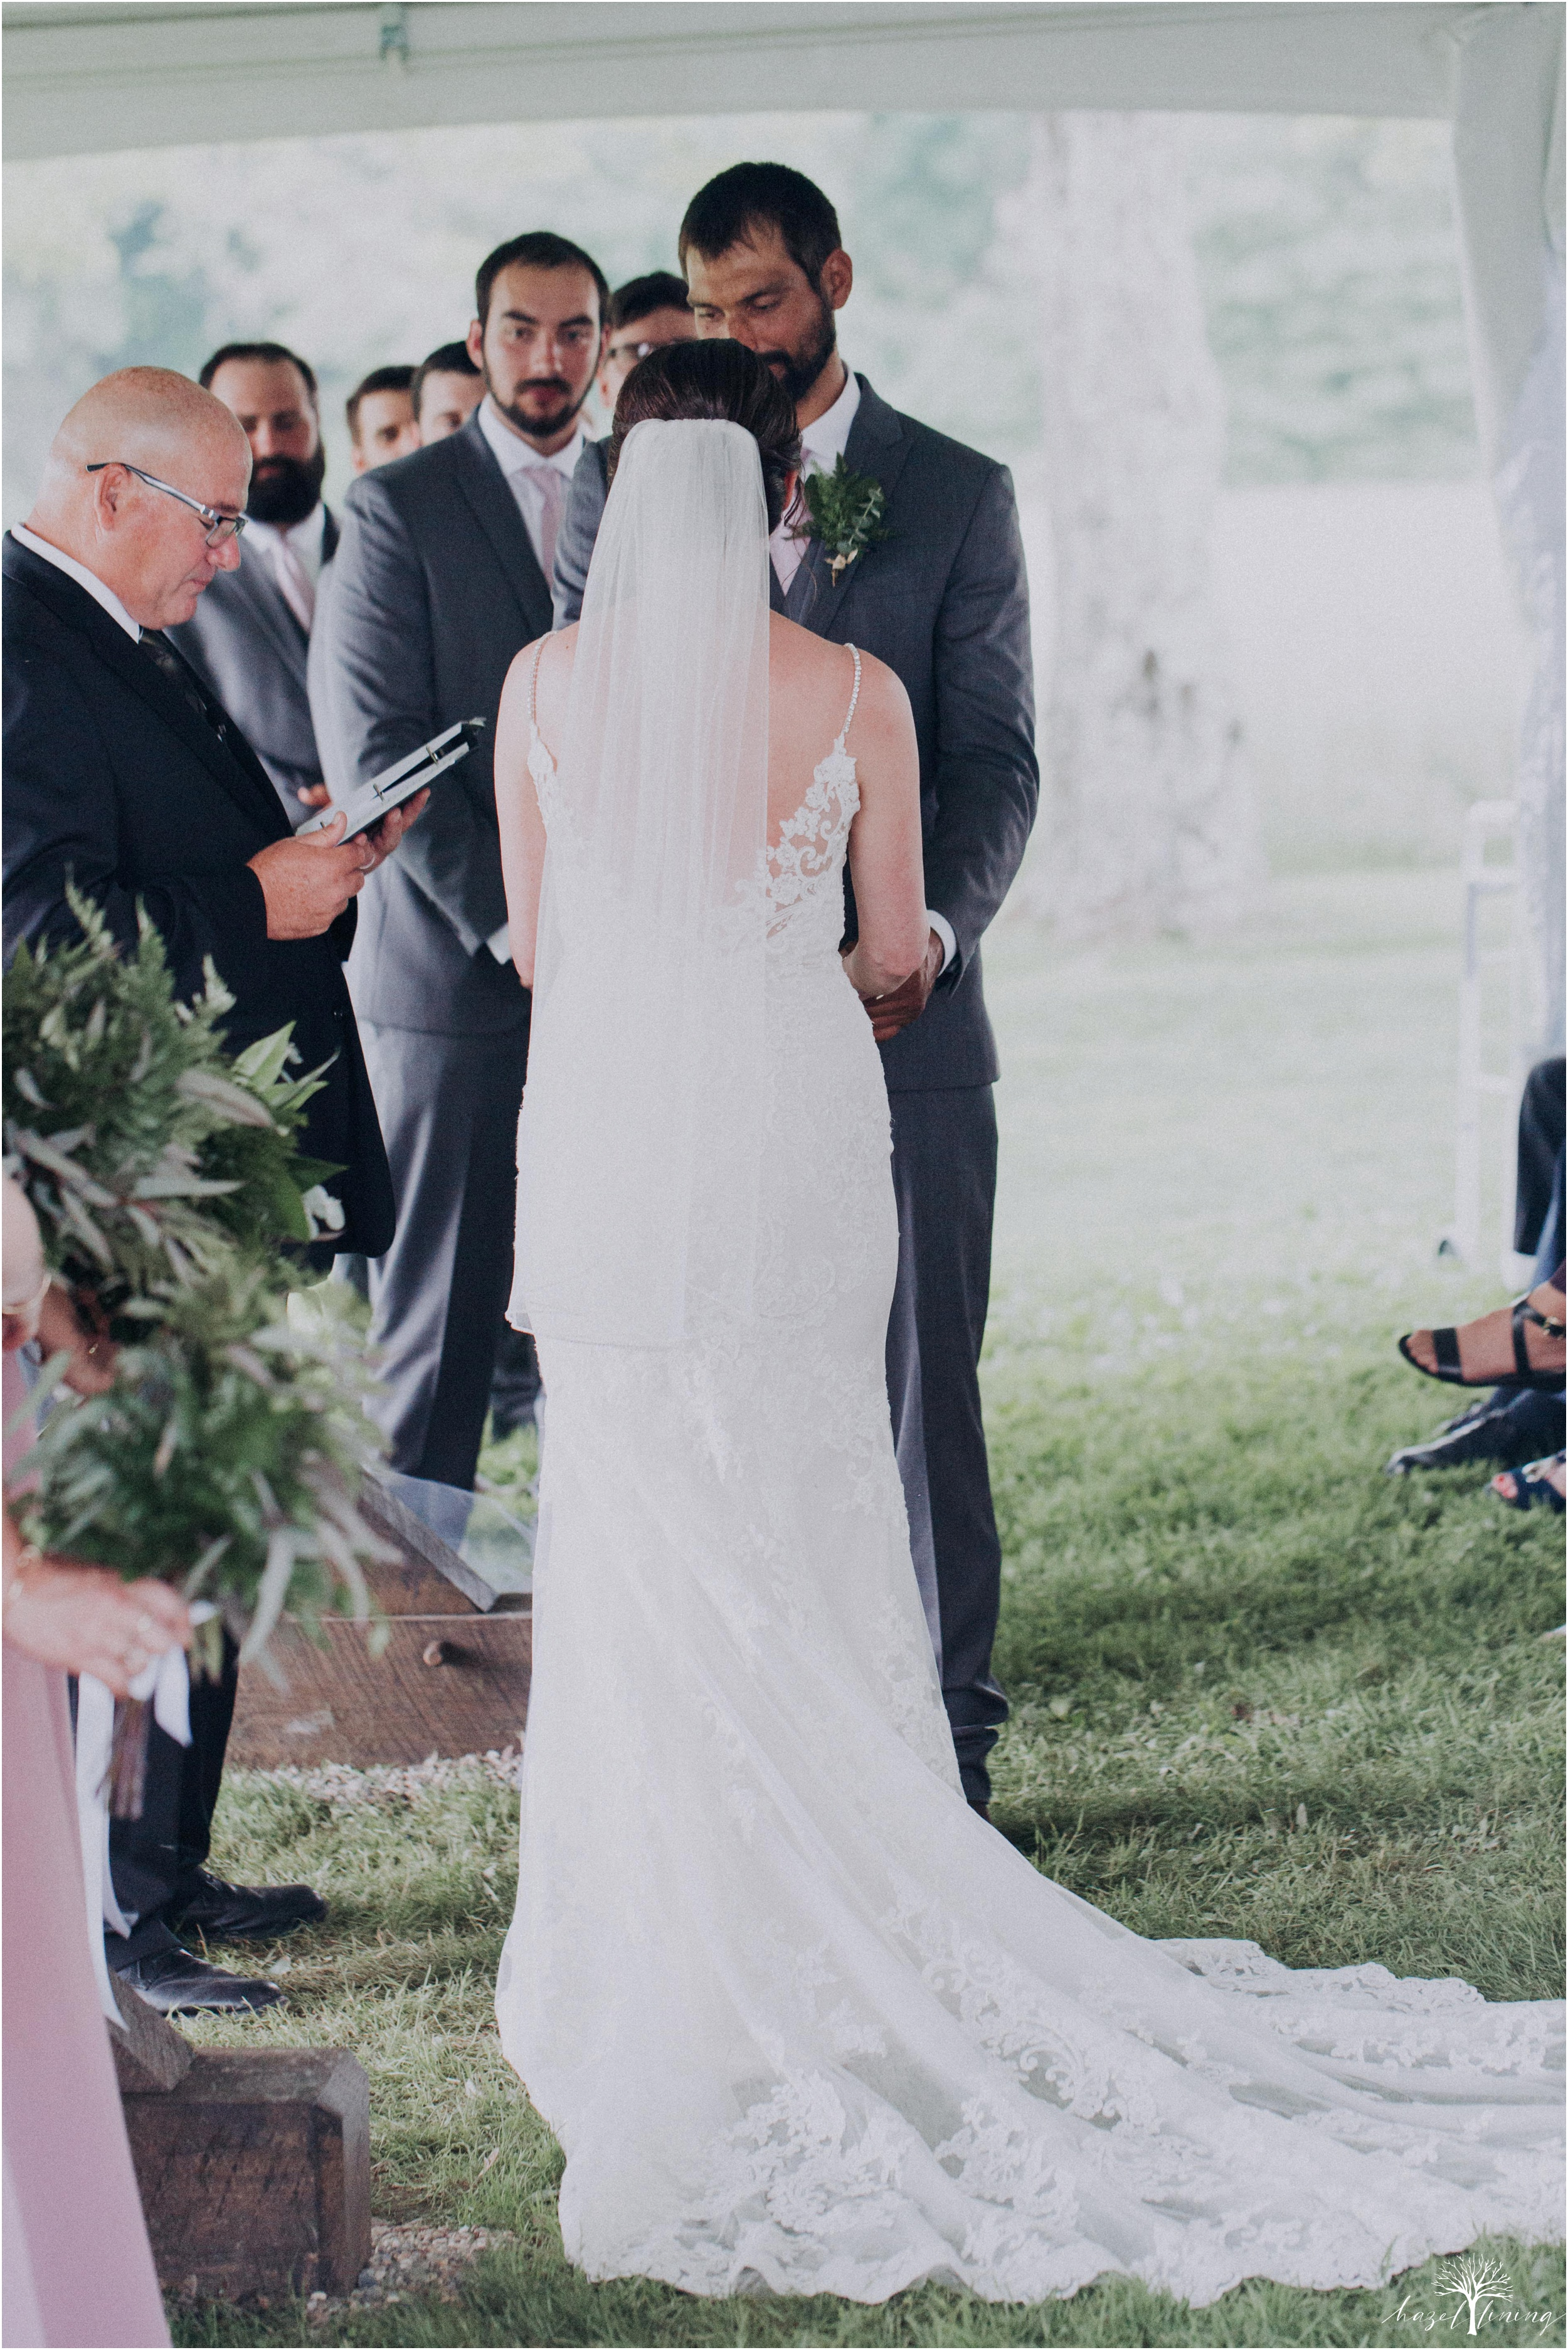 hazel-lining-travel-wedding-elopement-photography-lisa-landon-shoemaker-the-farm-bakery-and-events-bucks-county-quakertown-pennsylvania-summer-country-outdoor-farm-wedding_0061.jpg